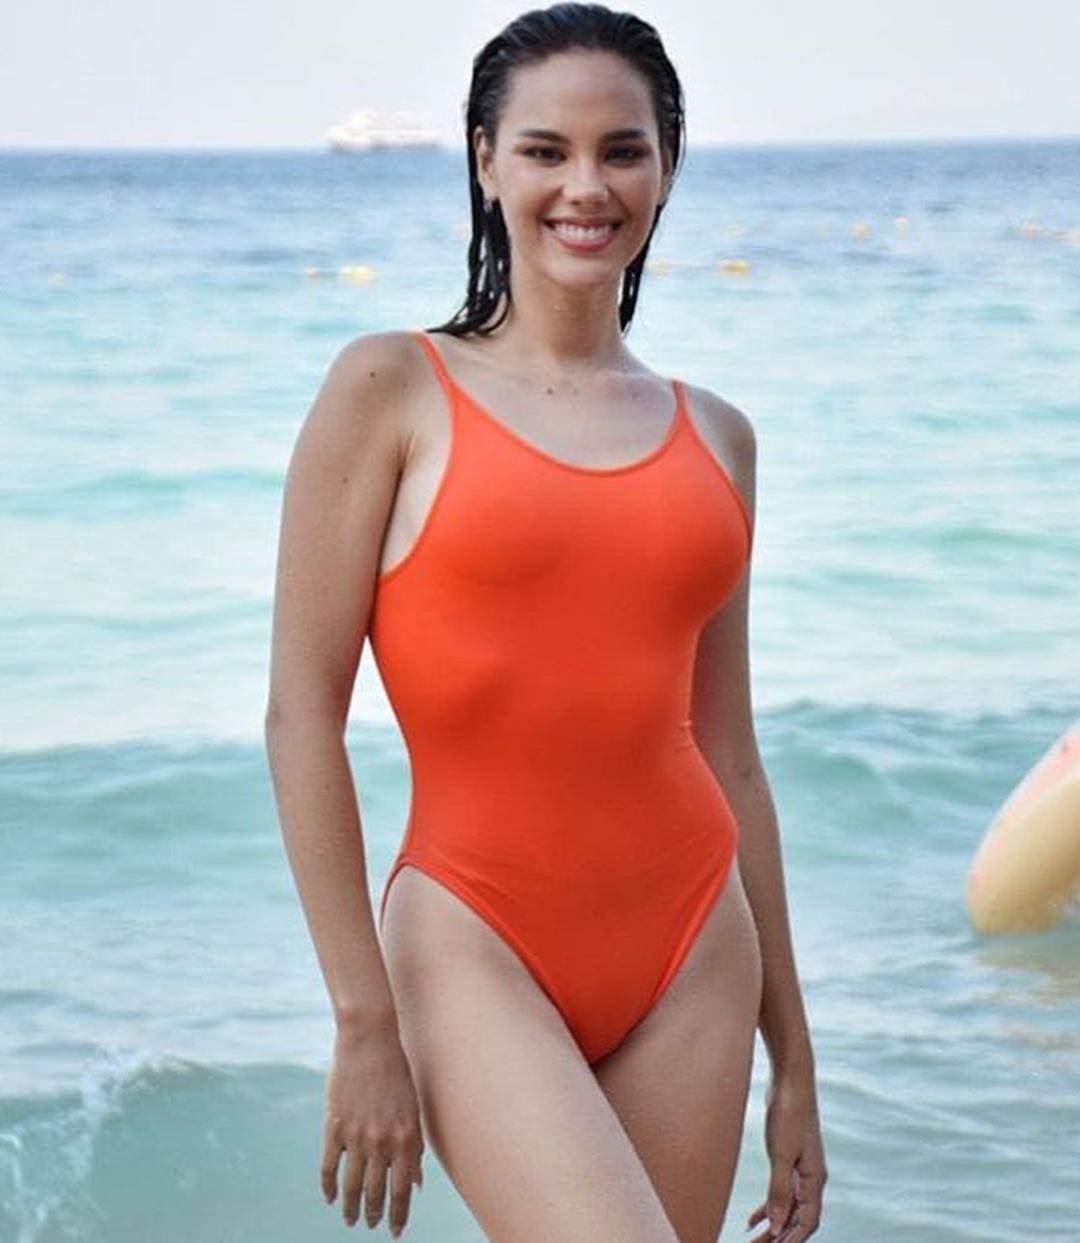 miss universe philippines 2018 de traje de bano. 266gnfmz